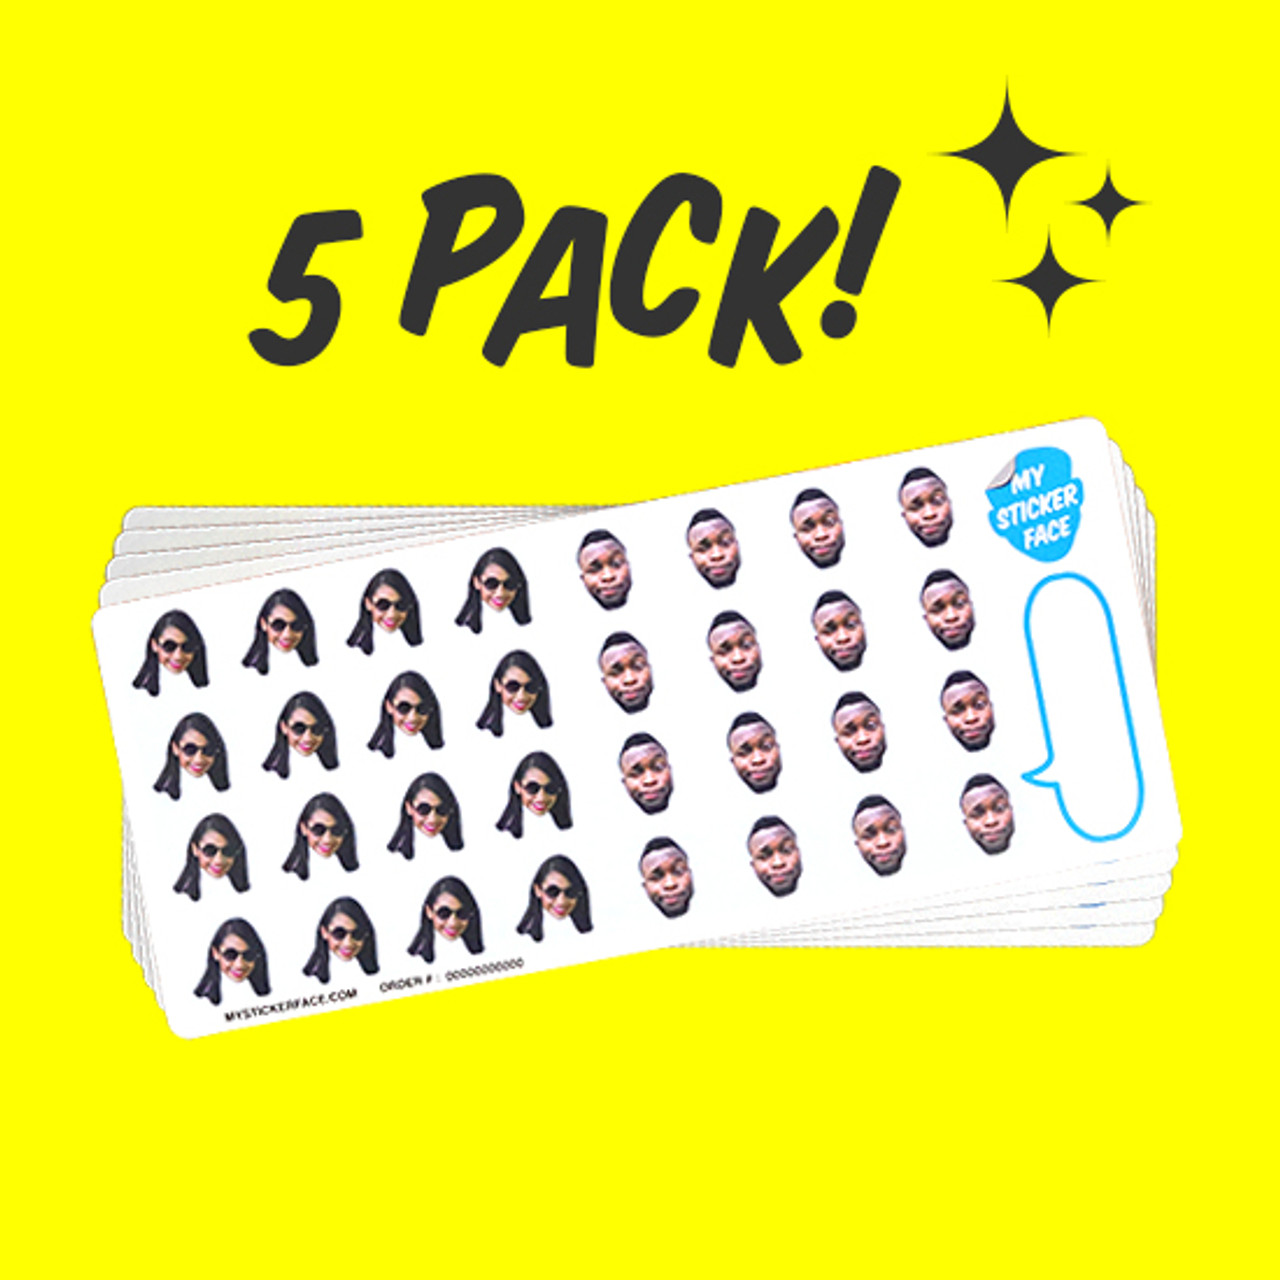 "Duo 0.75"" Face Sticker Sheet - 5 Pack"